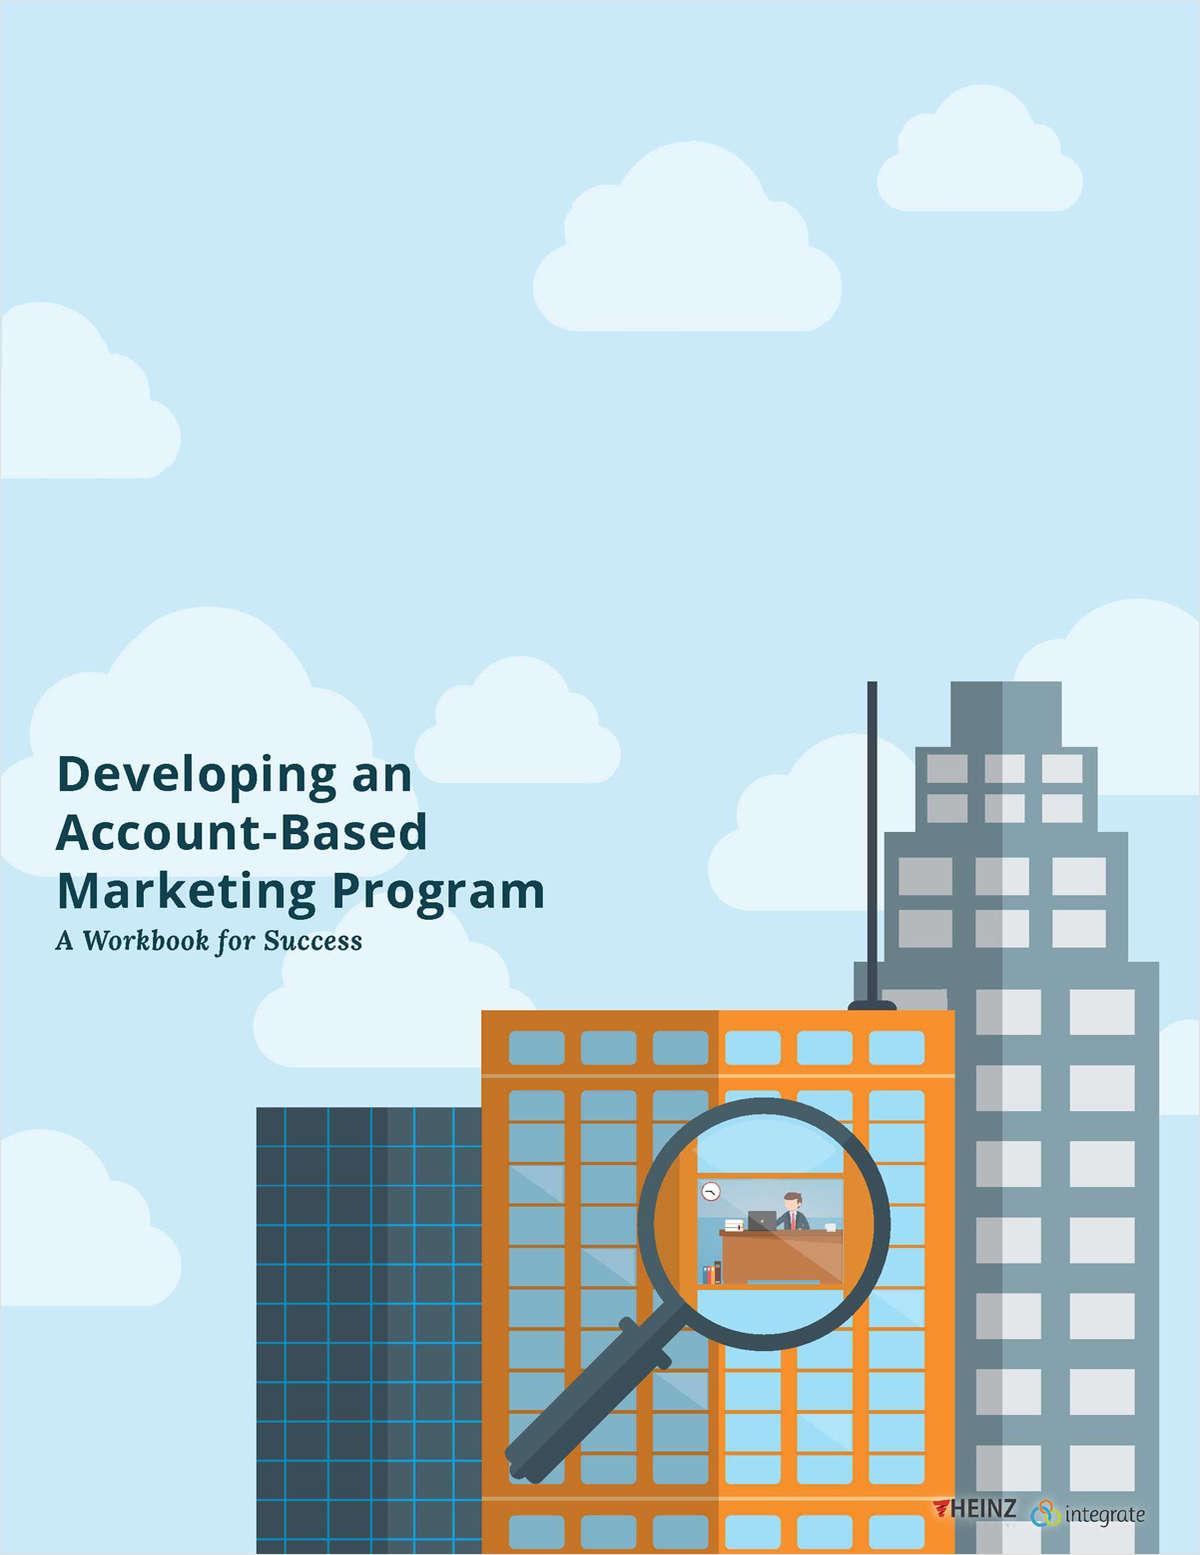 Developing an Account-Based Marketing Program